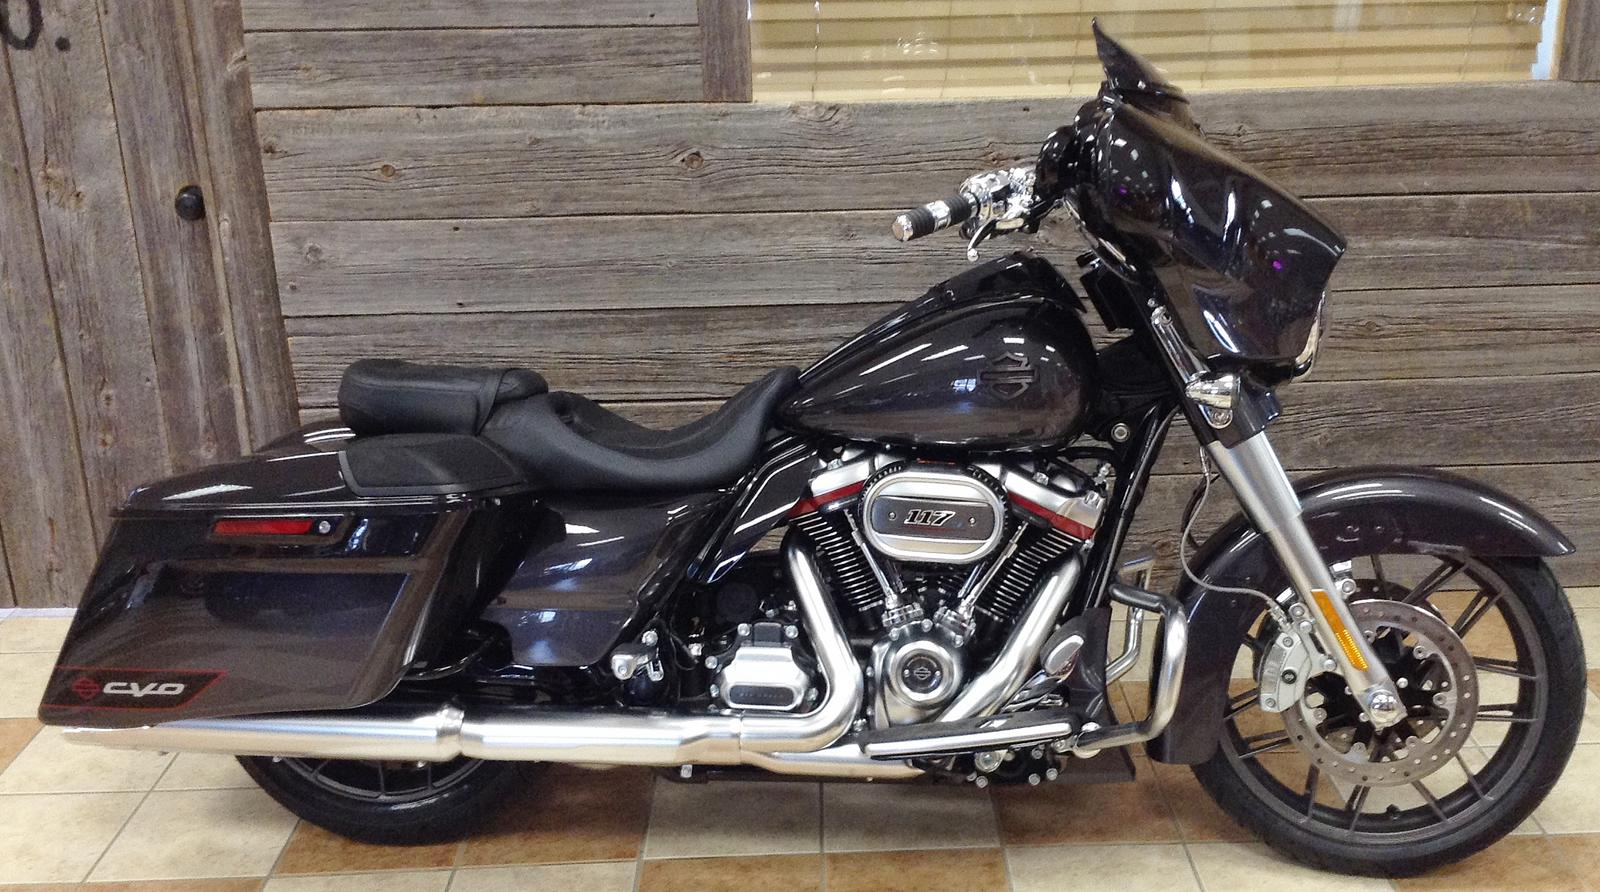 2020 Harley Davidson Cvo Street Glide Custom Color For